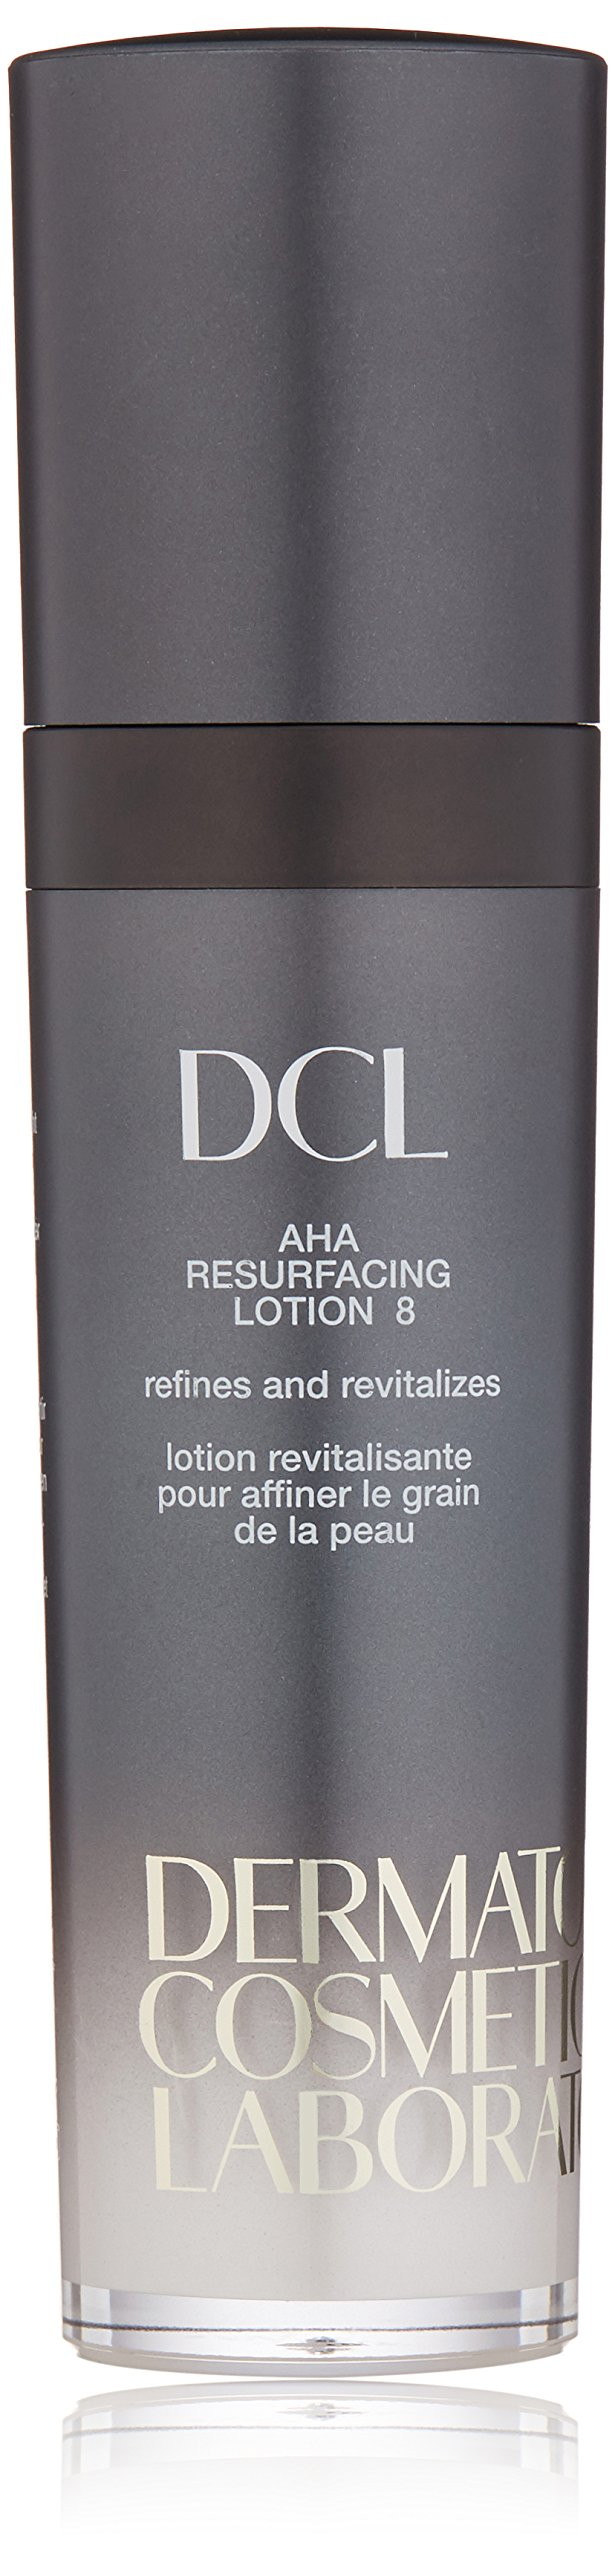 Dermatologic Cosmetic Laboratories AHA Resurfacing Lotion 8, 1.7 fl. oz. by Dermatologic Cosmetic Laboratories